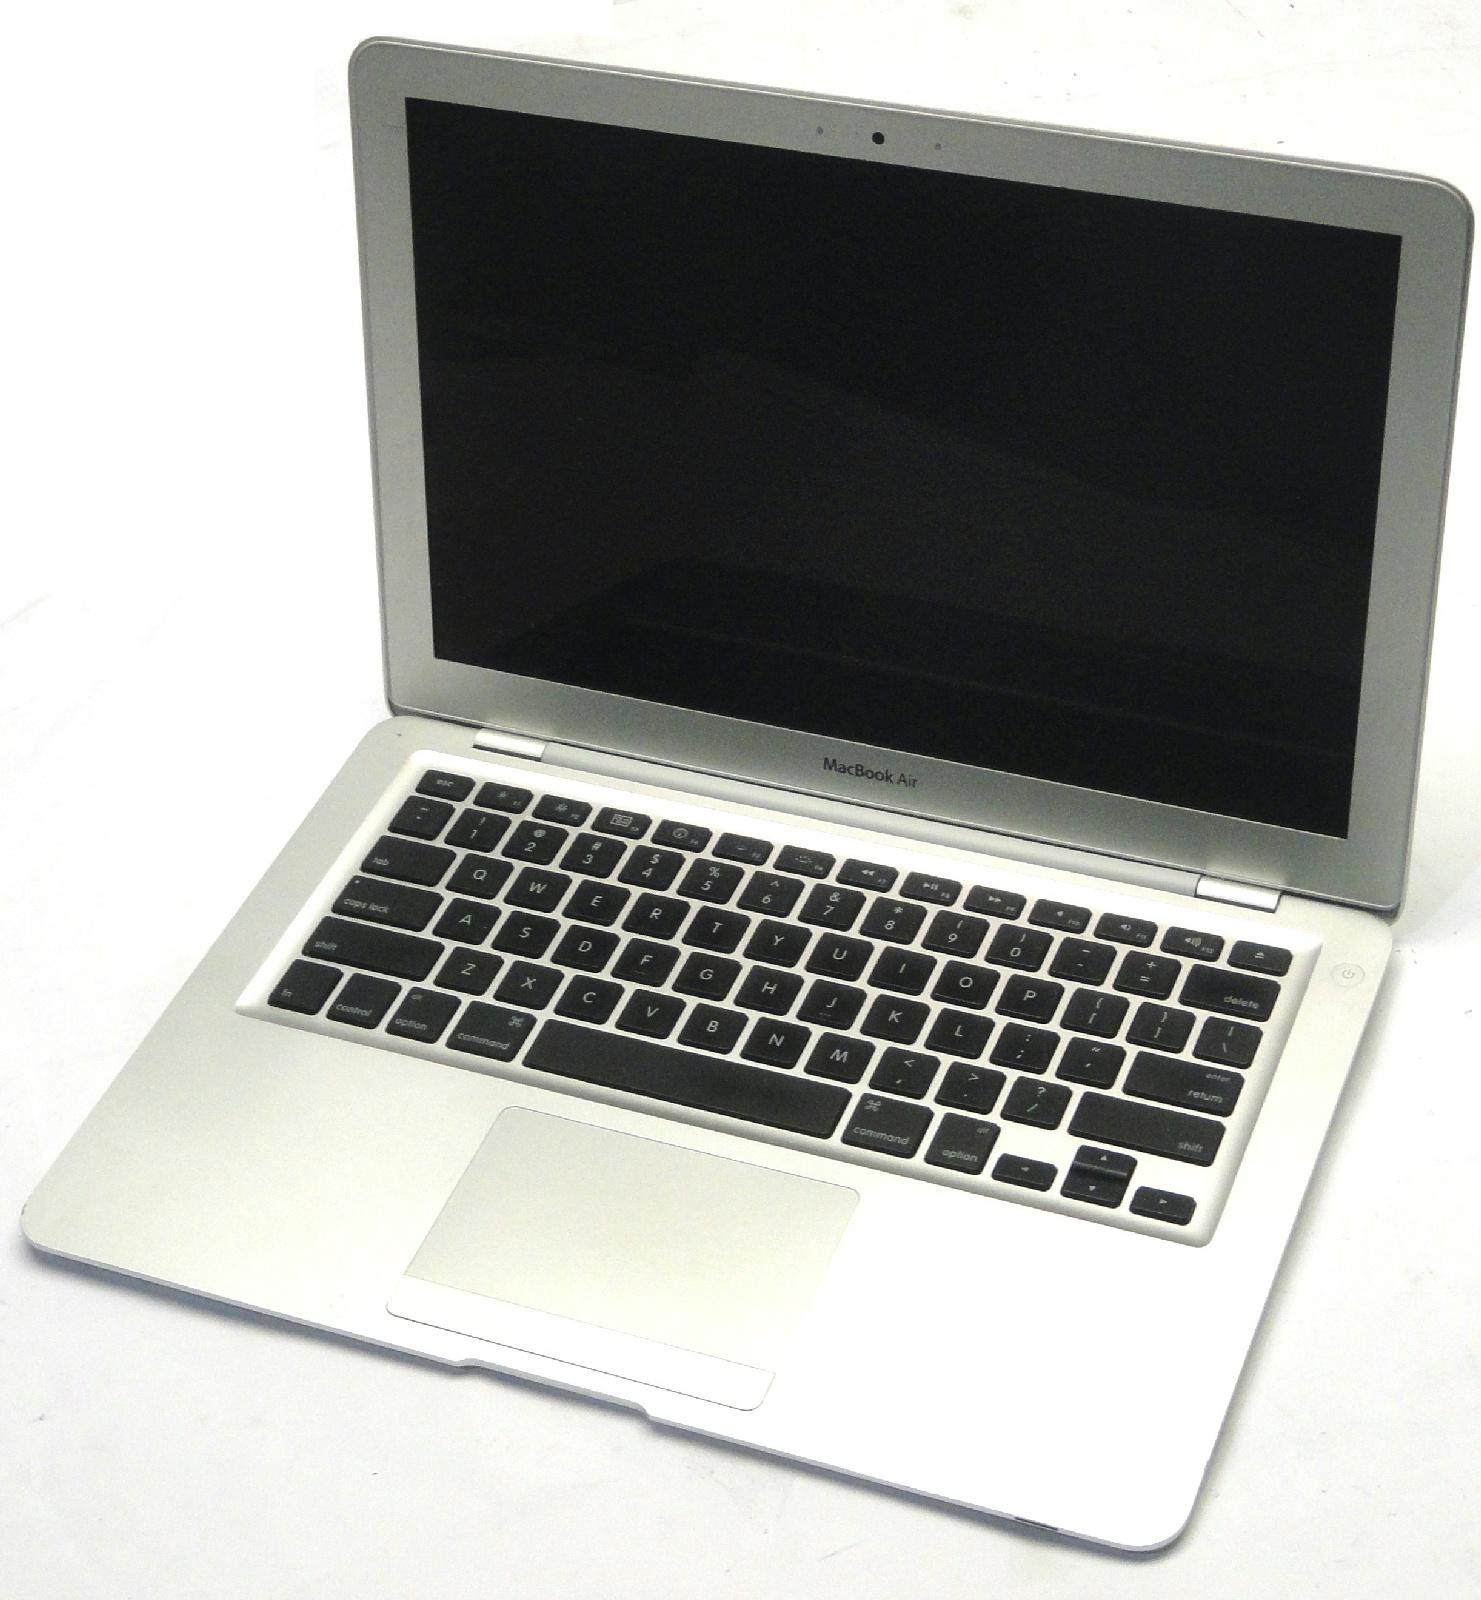 how to erase 2008 macbook hard drive